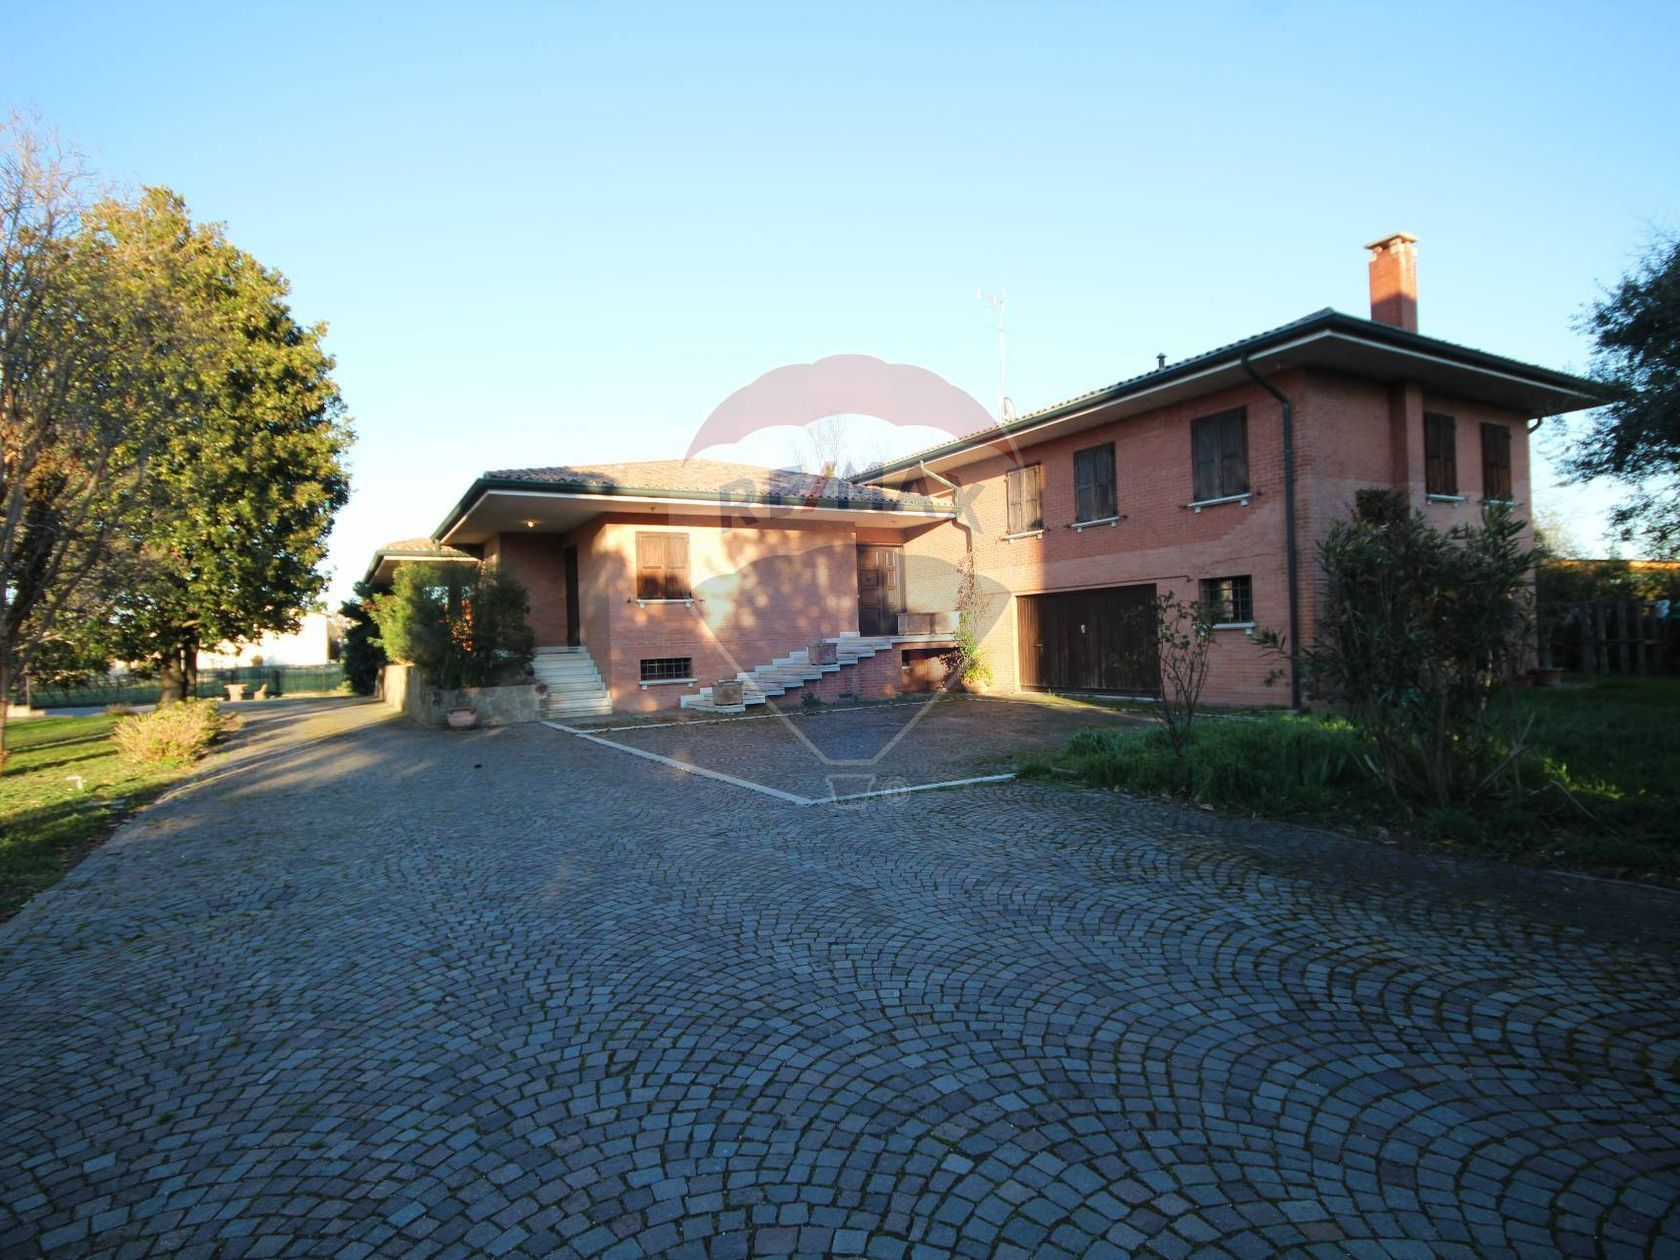 Villa singola Pegolotte, Cona, VE Vendita - Foto 2